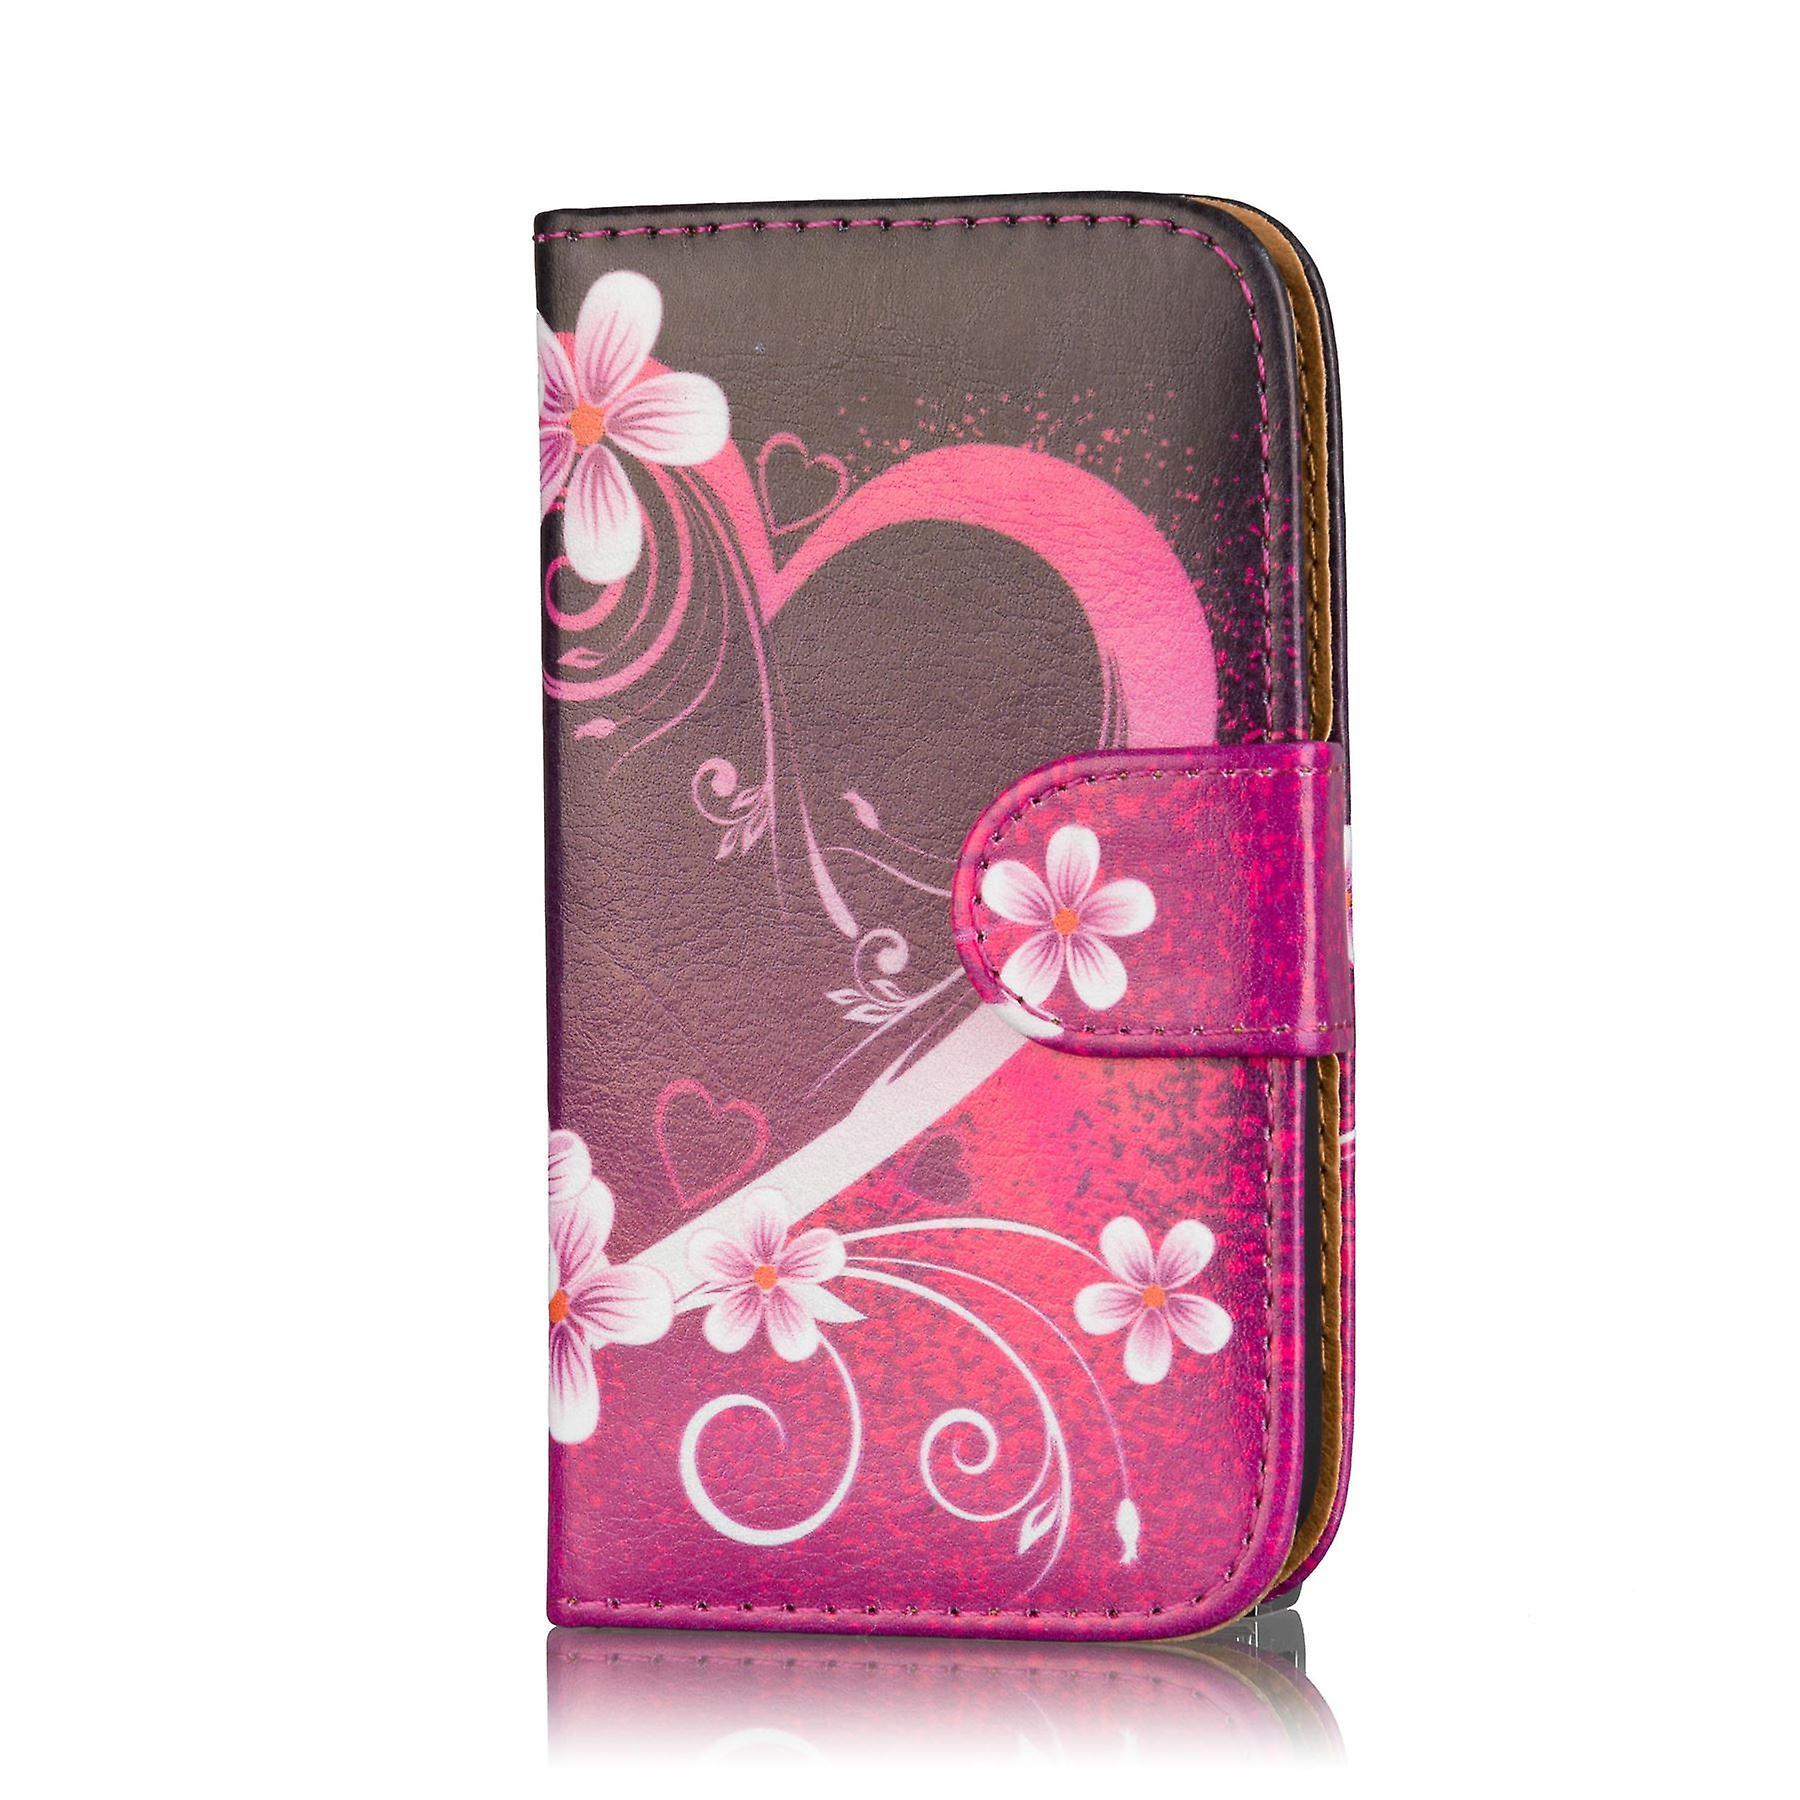 Design book wallet case for Motorola Moto G2 2014 - Love Heart